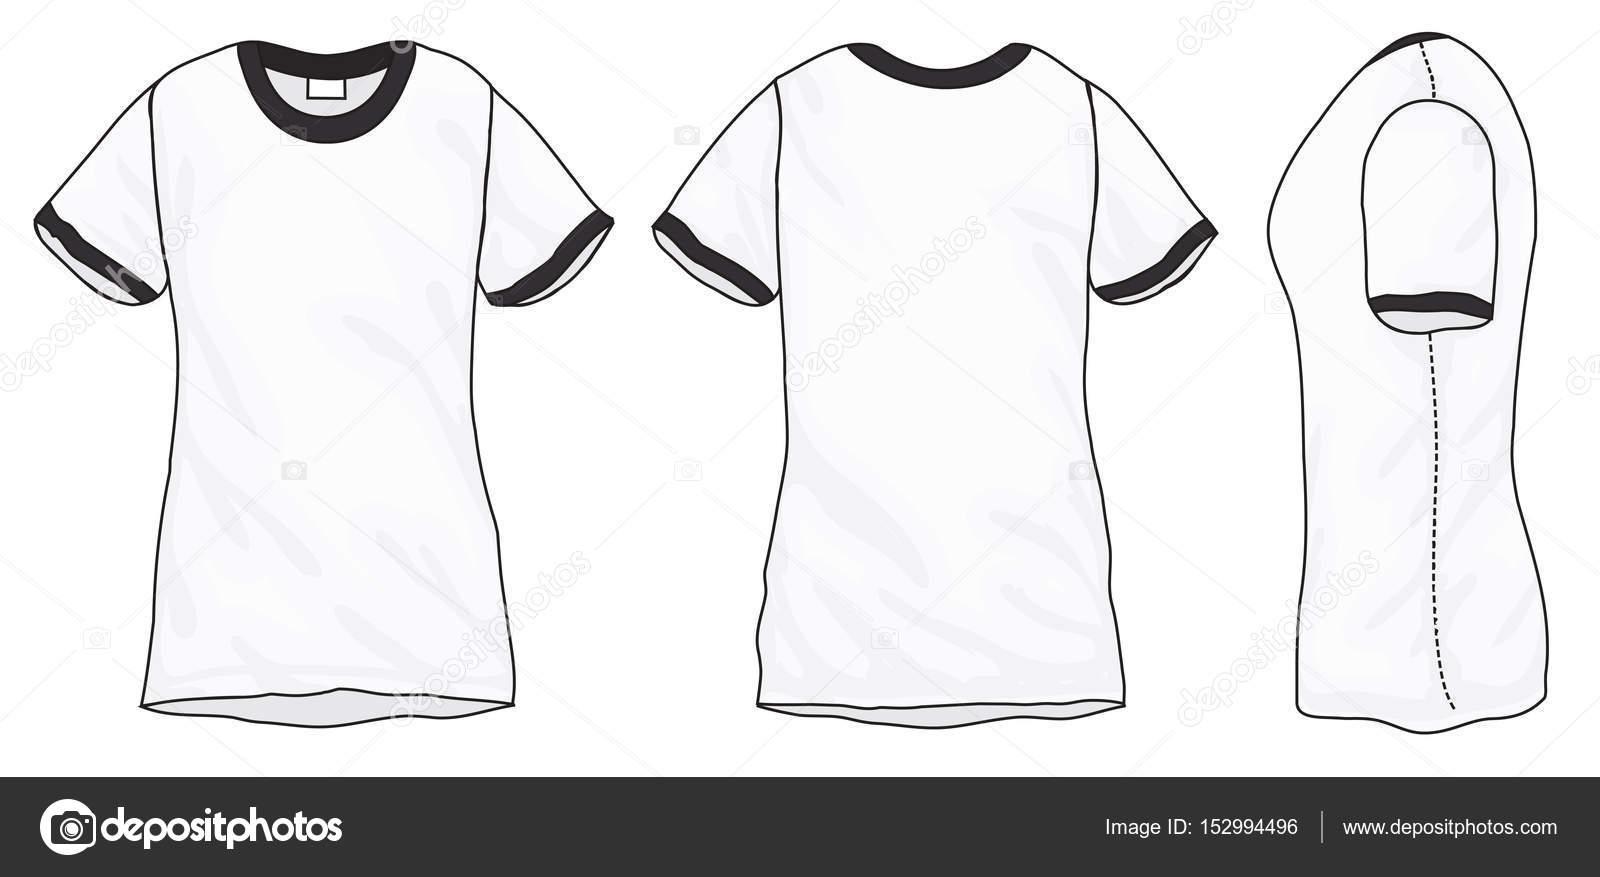 Black White Ringer TShirt Design Template Stock Vector Airdone - Tee shirt design template